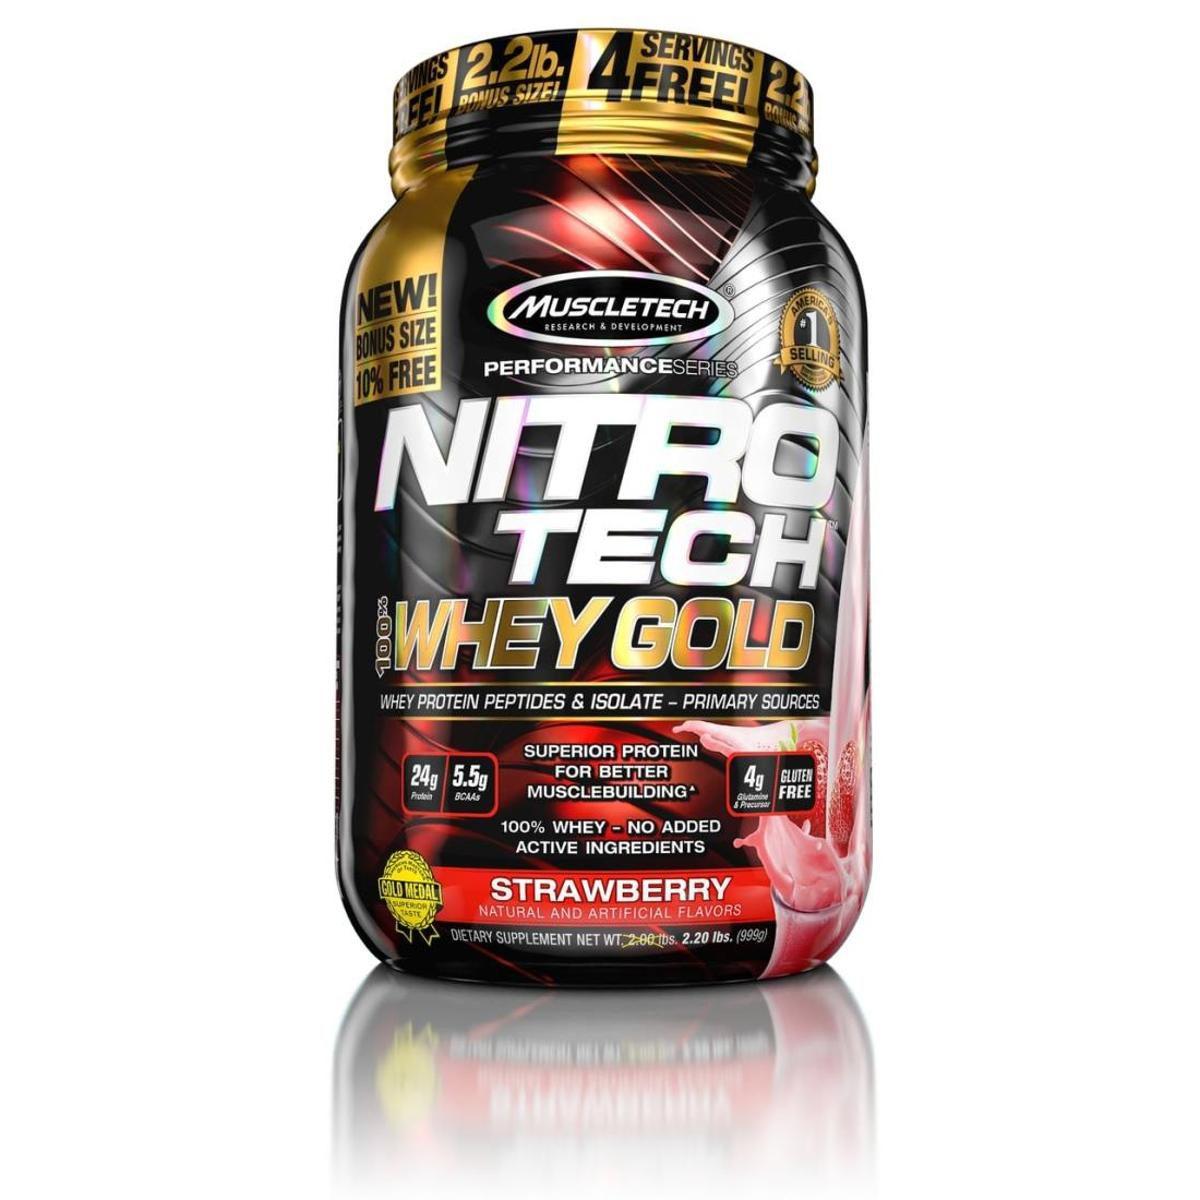 Nitro Tech 100% Whey Gold 2,2 lbs MuscleTech